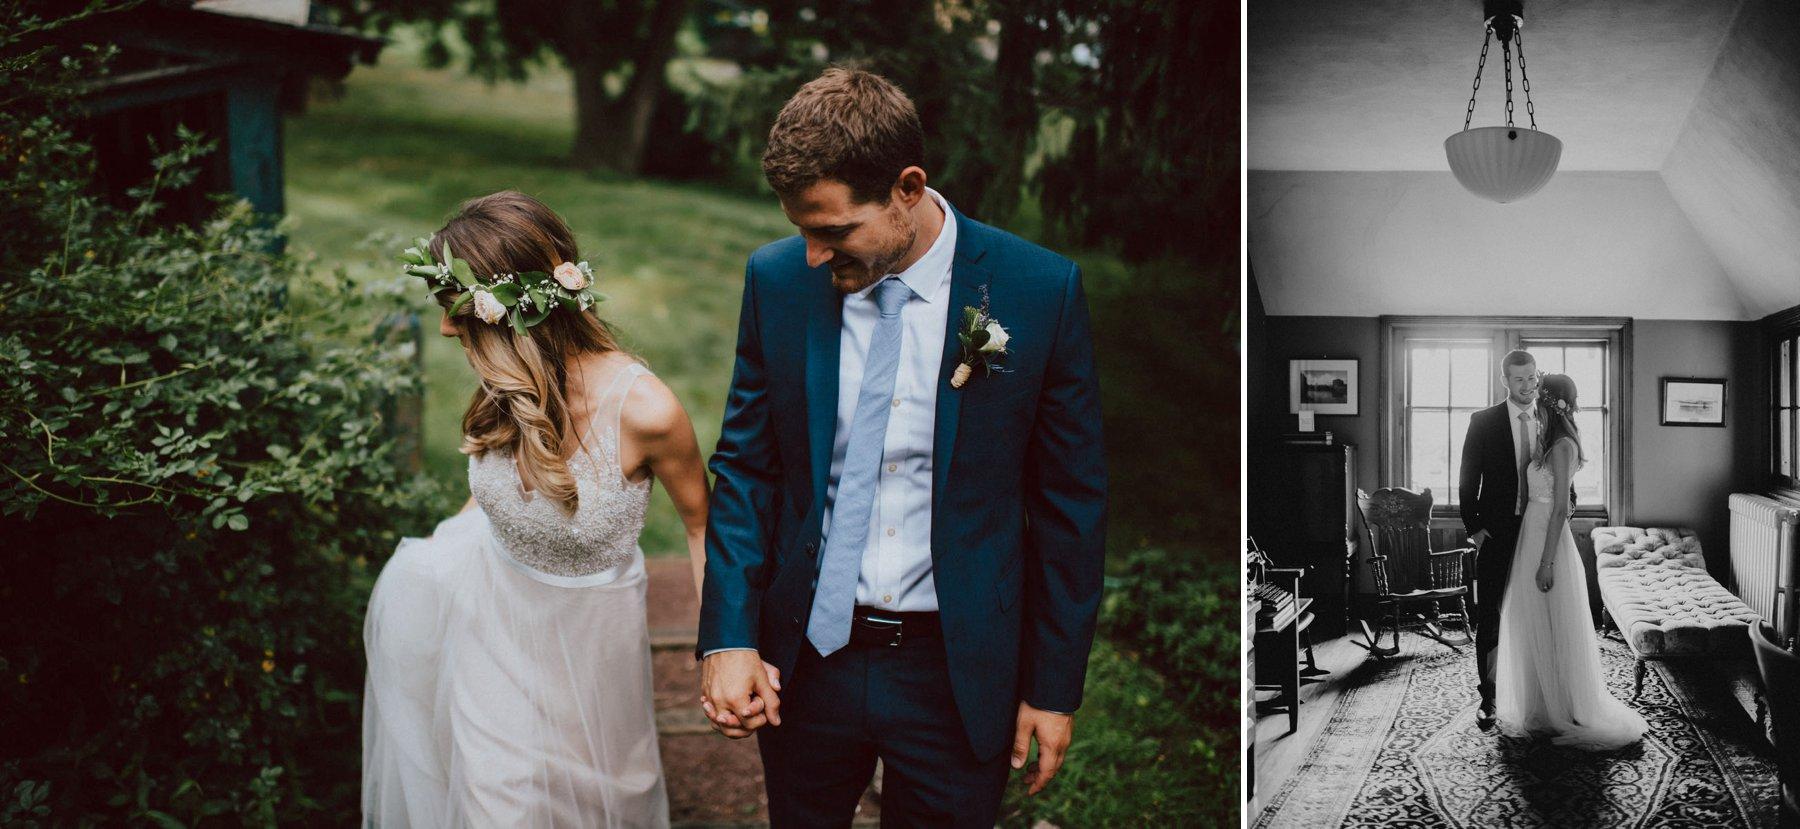 Knowlton-mansion-wedding-81.jpg